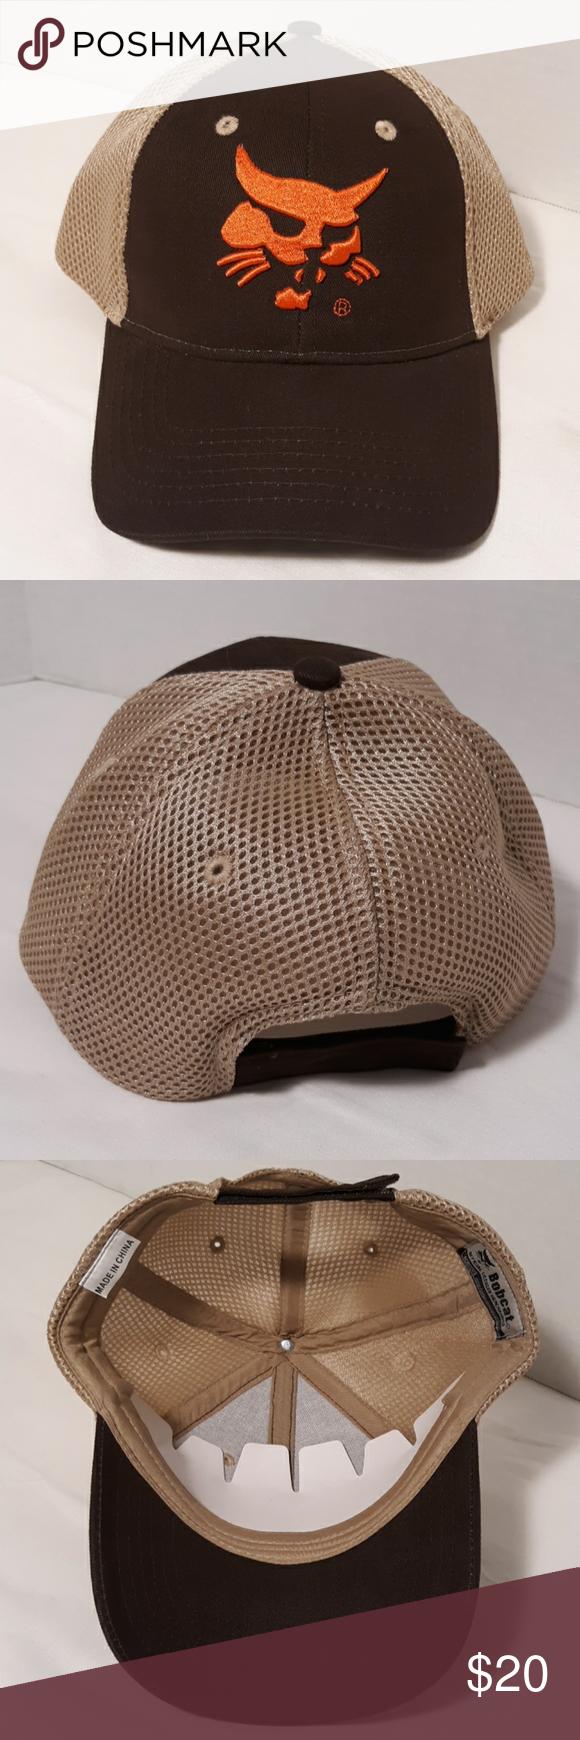 20 Bobcat Trucker Hat Brand New Embroidered In 2020 Trucker Hat Hats Brand New